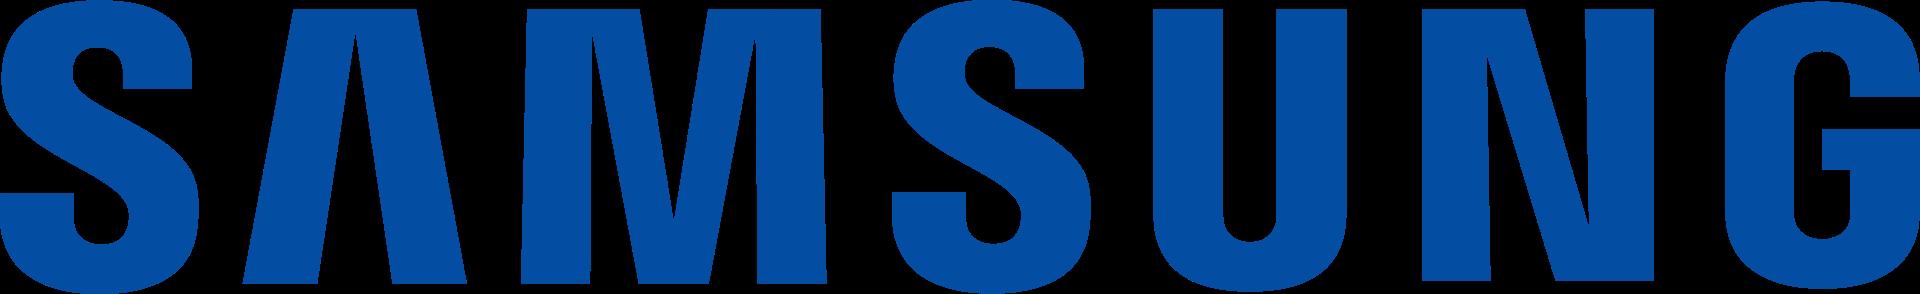 logo samsung 2020